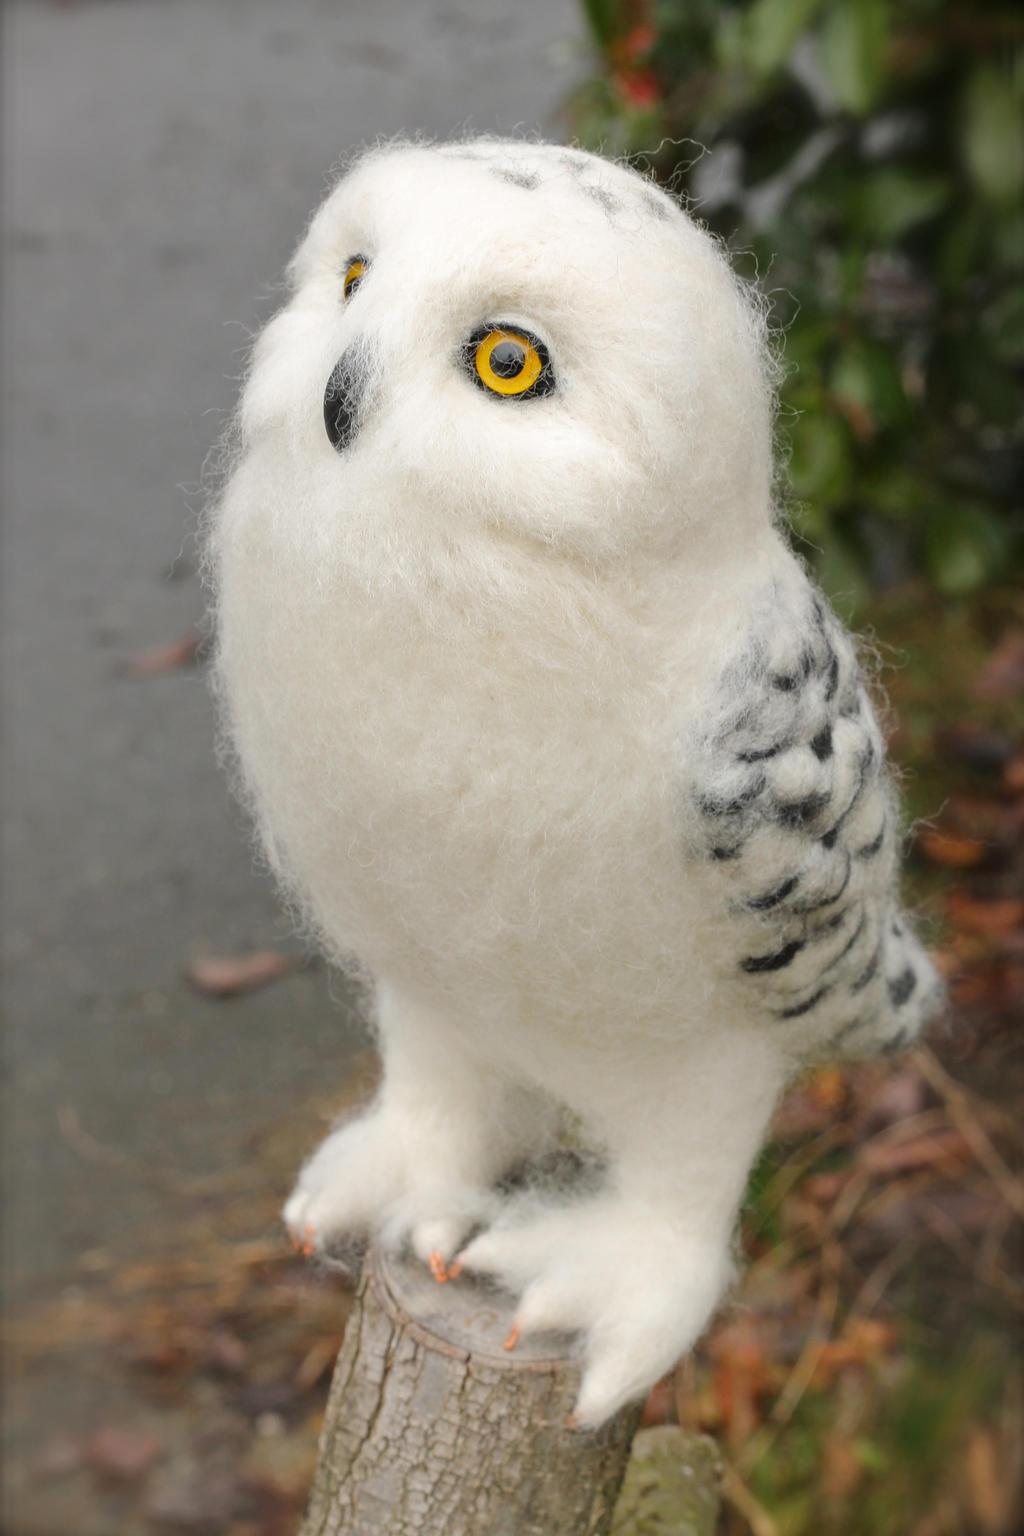 Cute baby white owl - photo#5